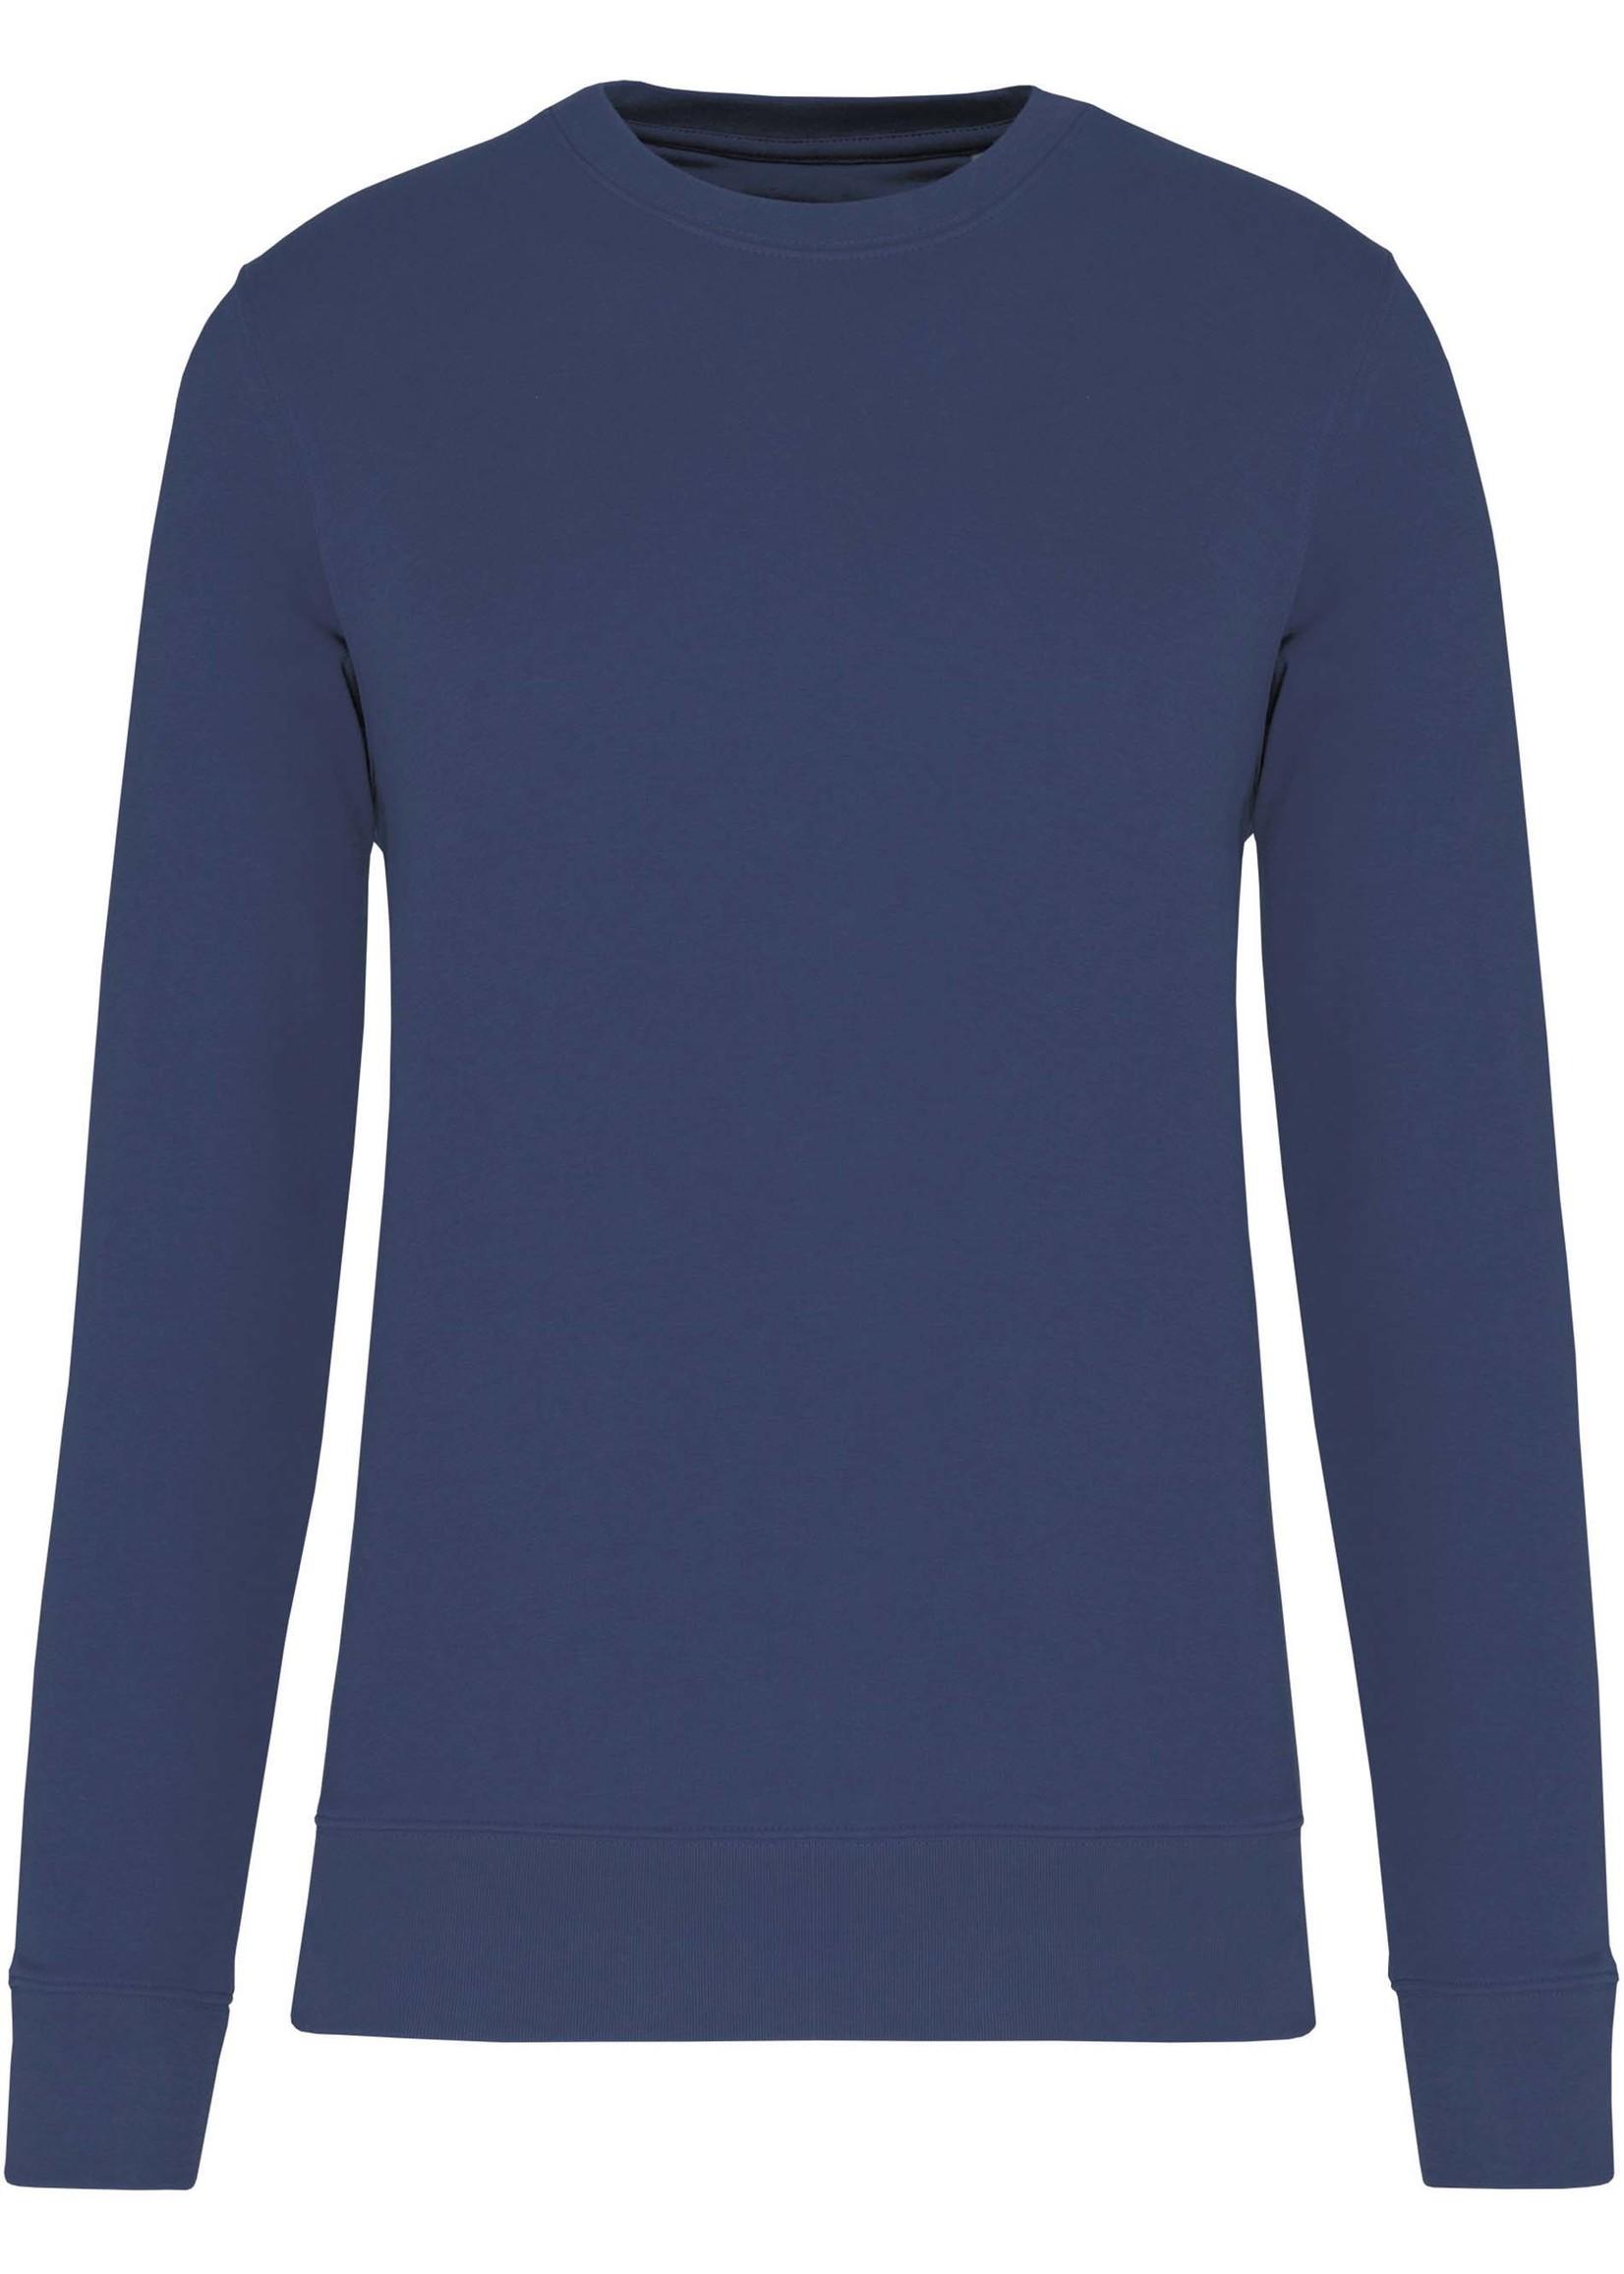 Eco-Friendly Sweater UNI Deep Blue